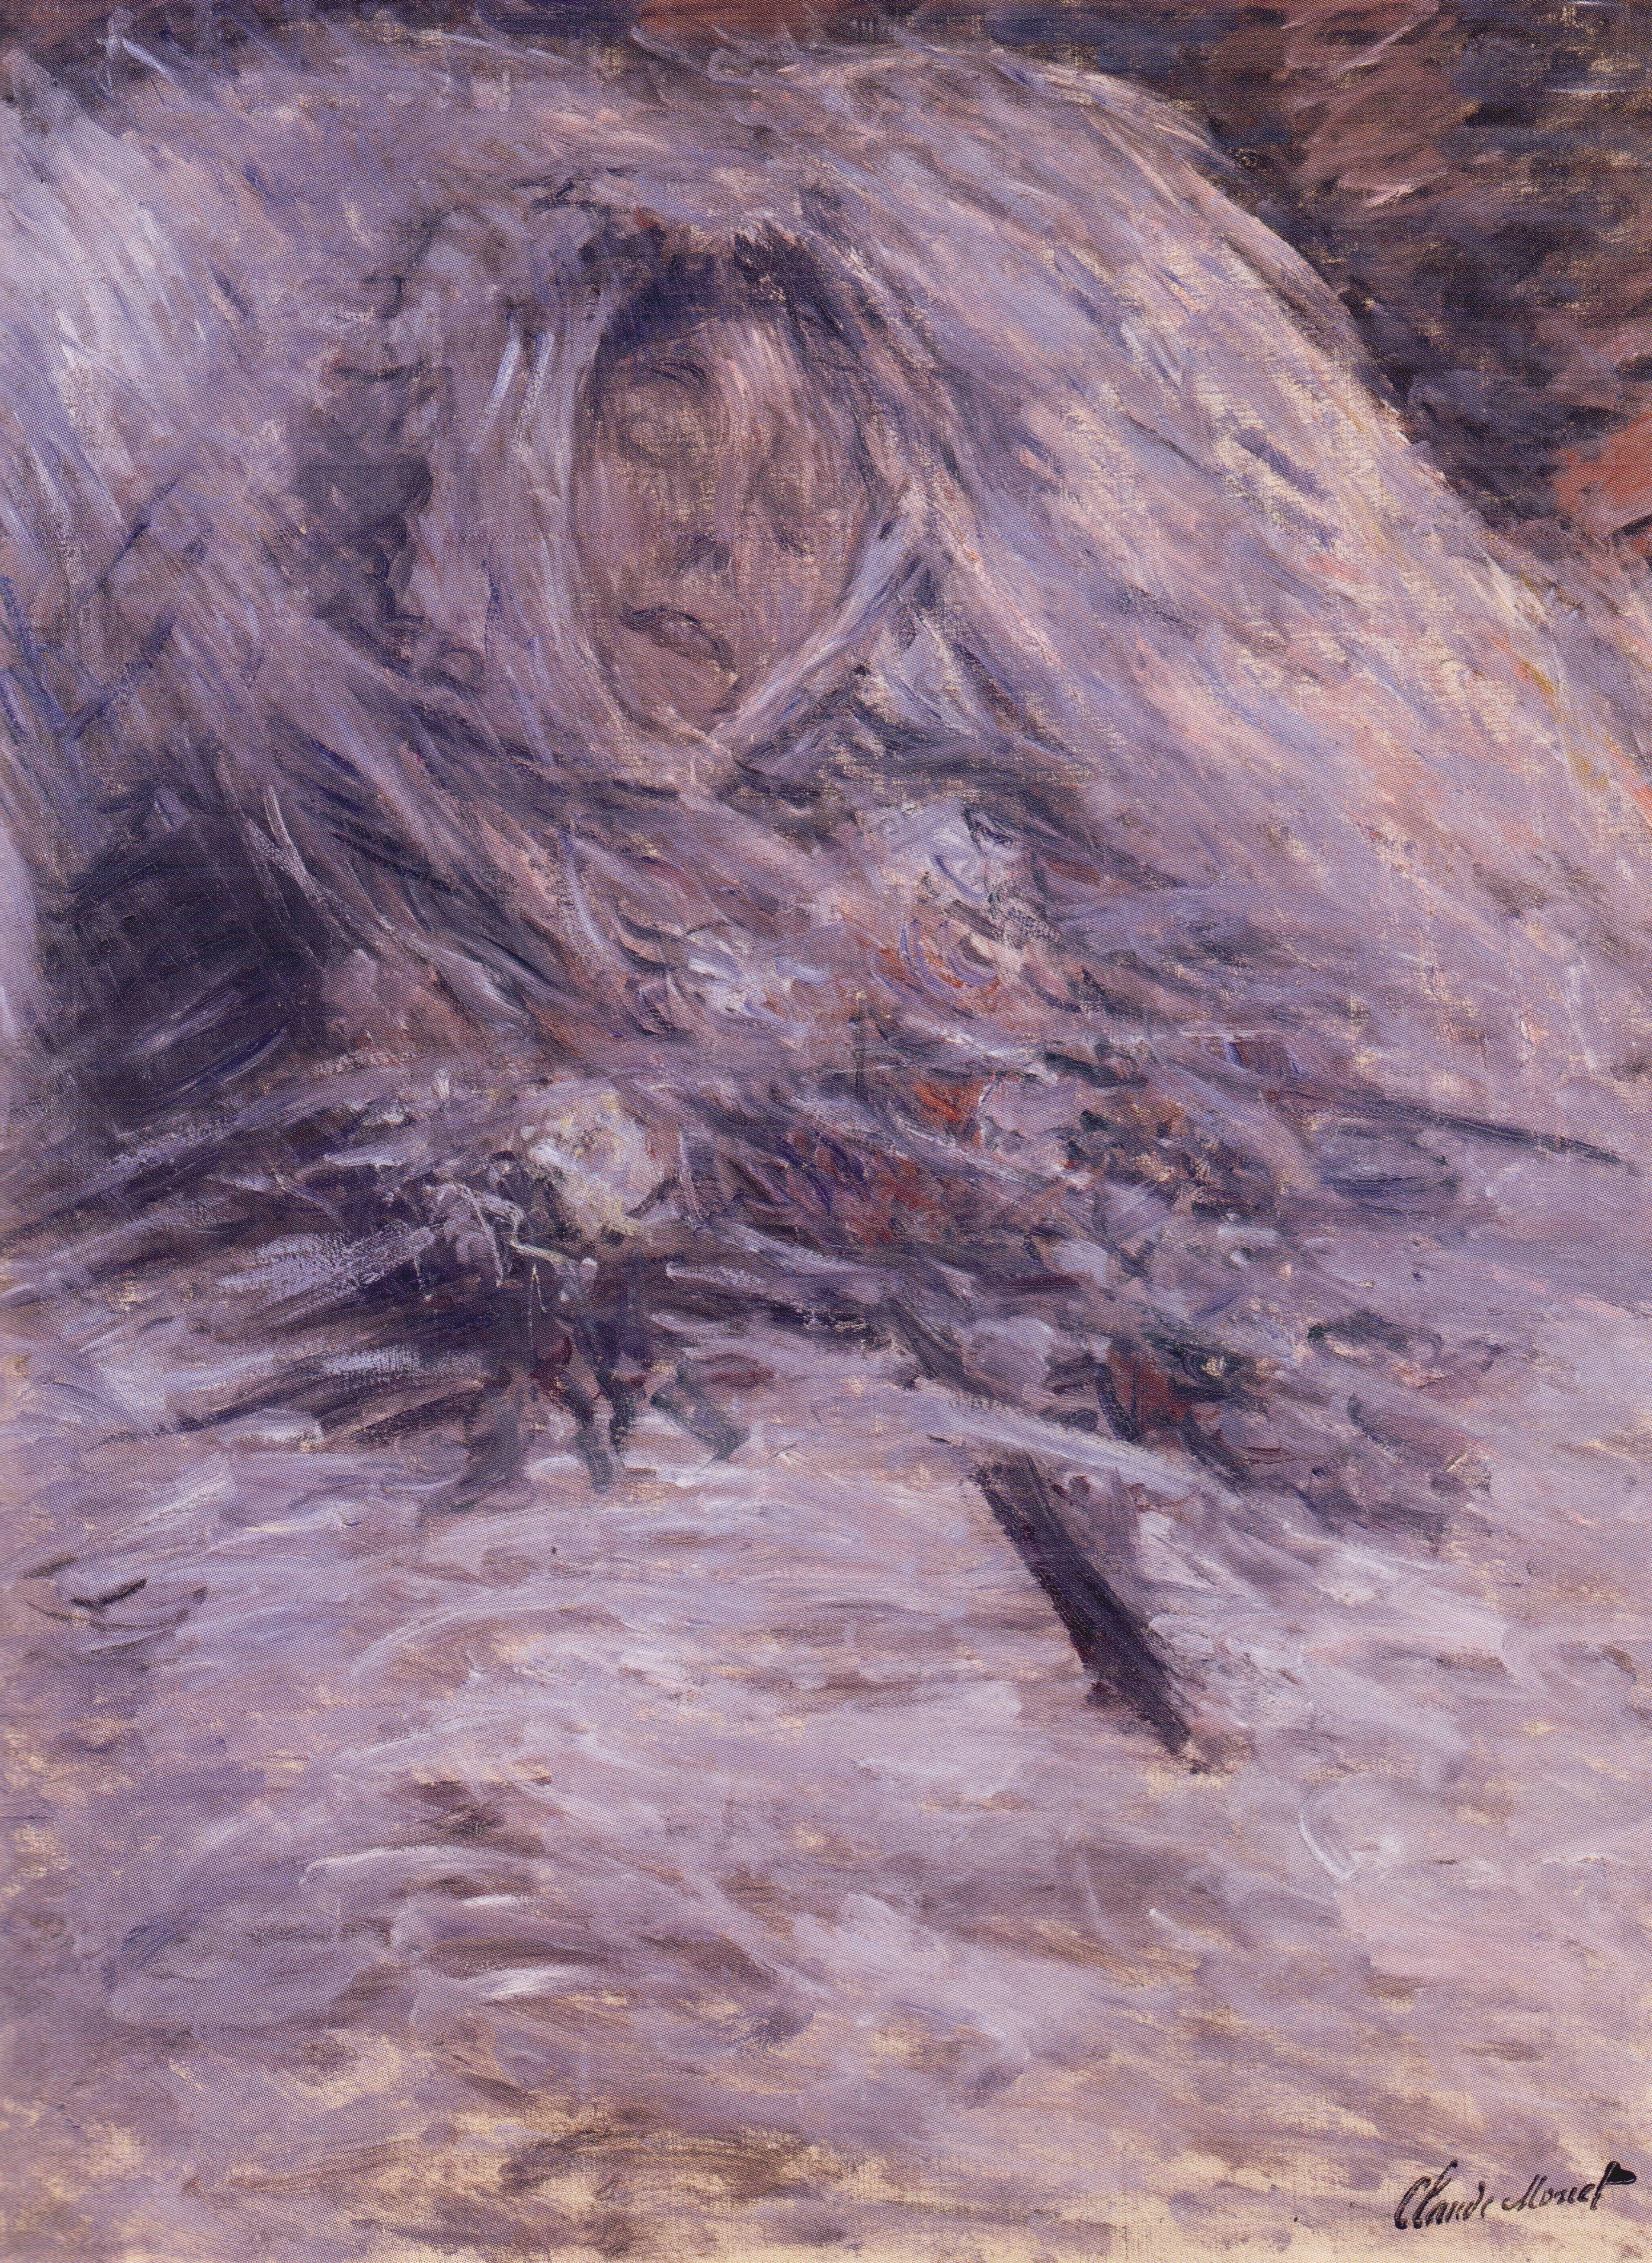 http://upload.wikimedia.org/wikipedia/commons/c/ce/Claude_Monet_-_Camille_Monet_sur_son_lit_de_mort.JPG